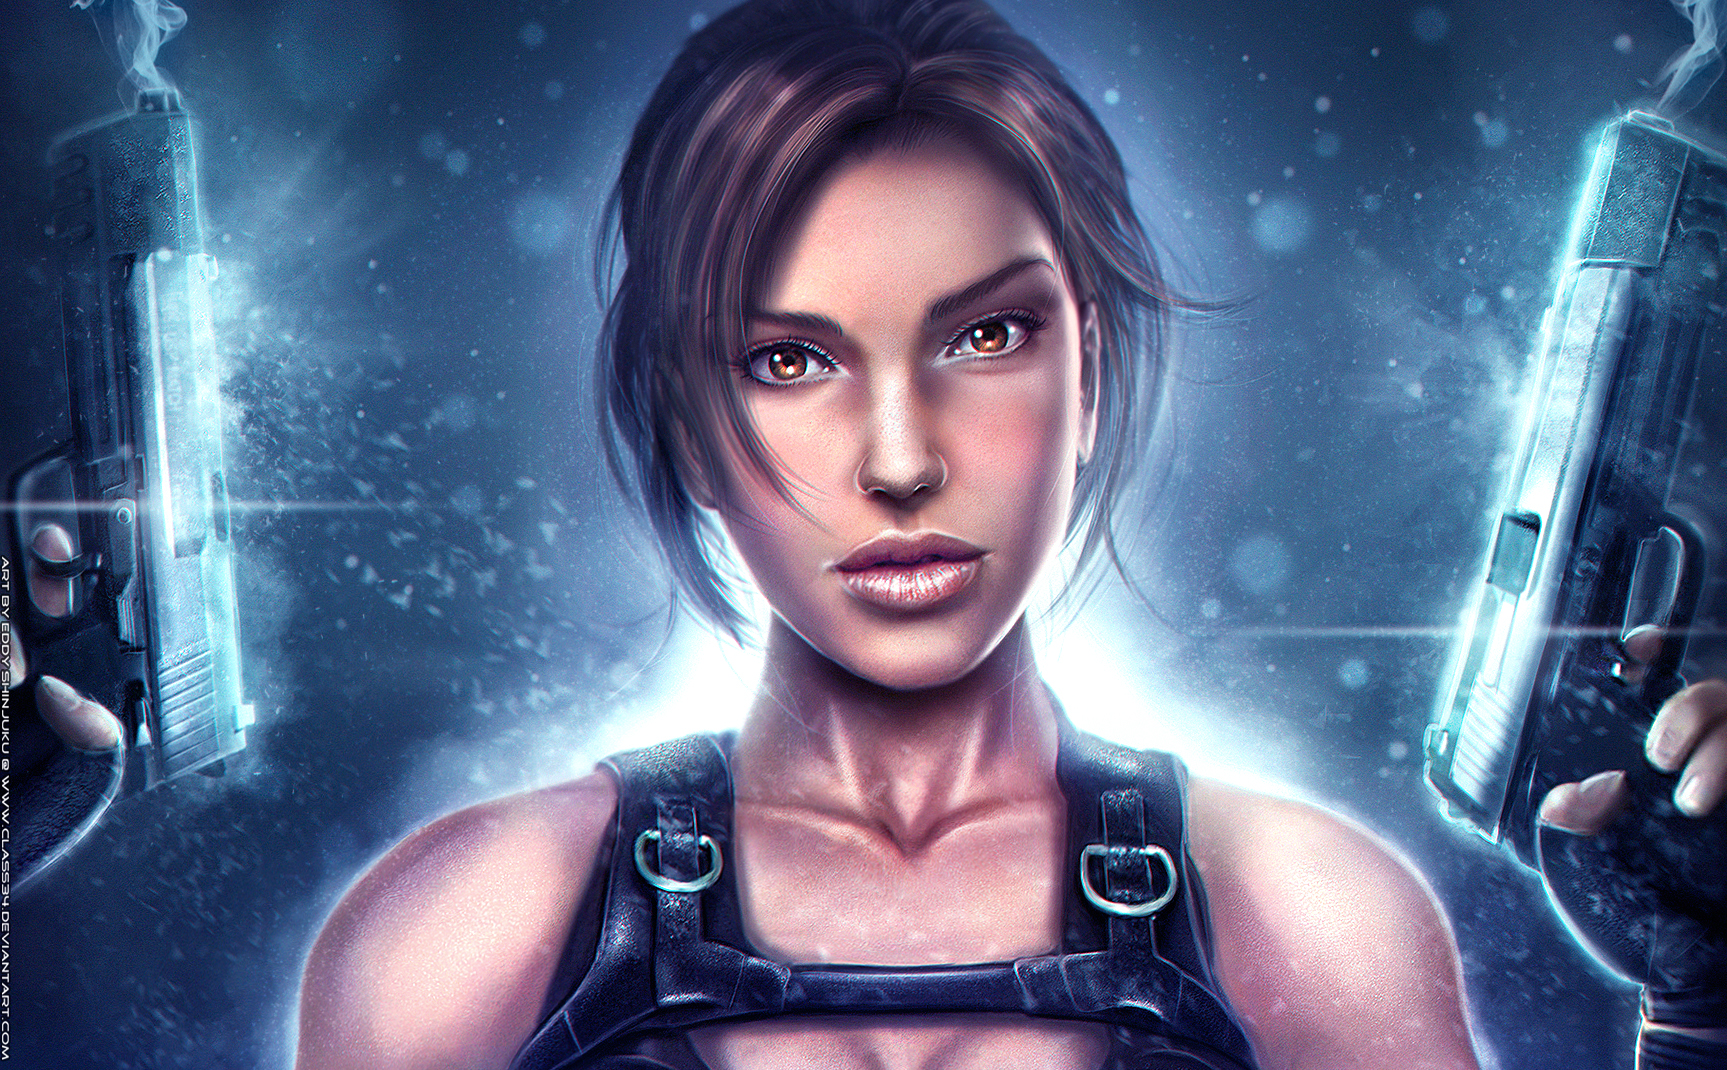 UNDERWORLD LARA: Two Is The Way To Be- Tomb Raider by Eddy-Shinjuku